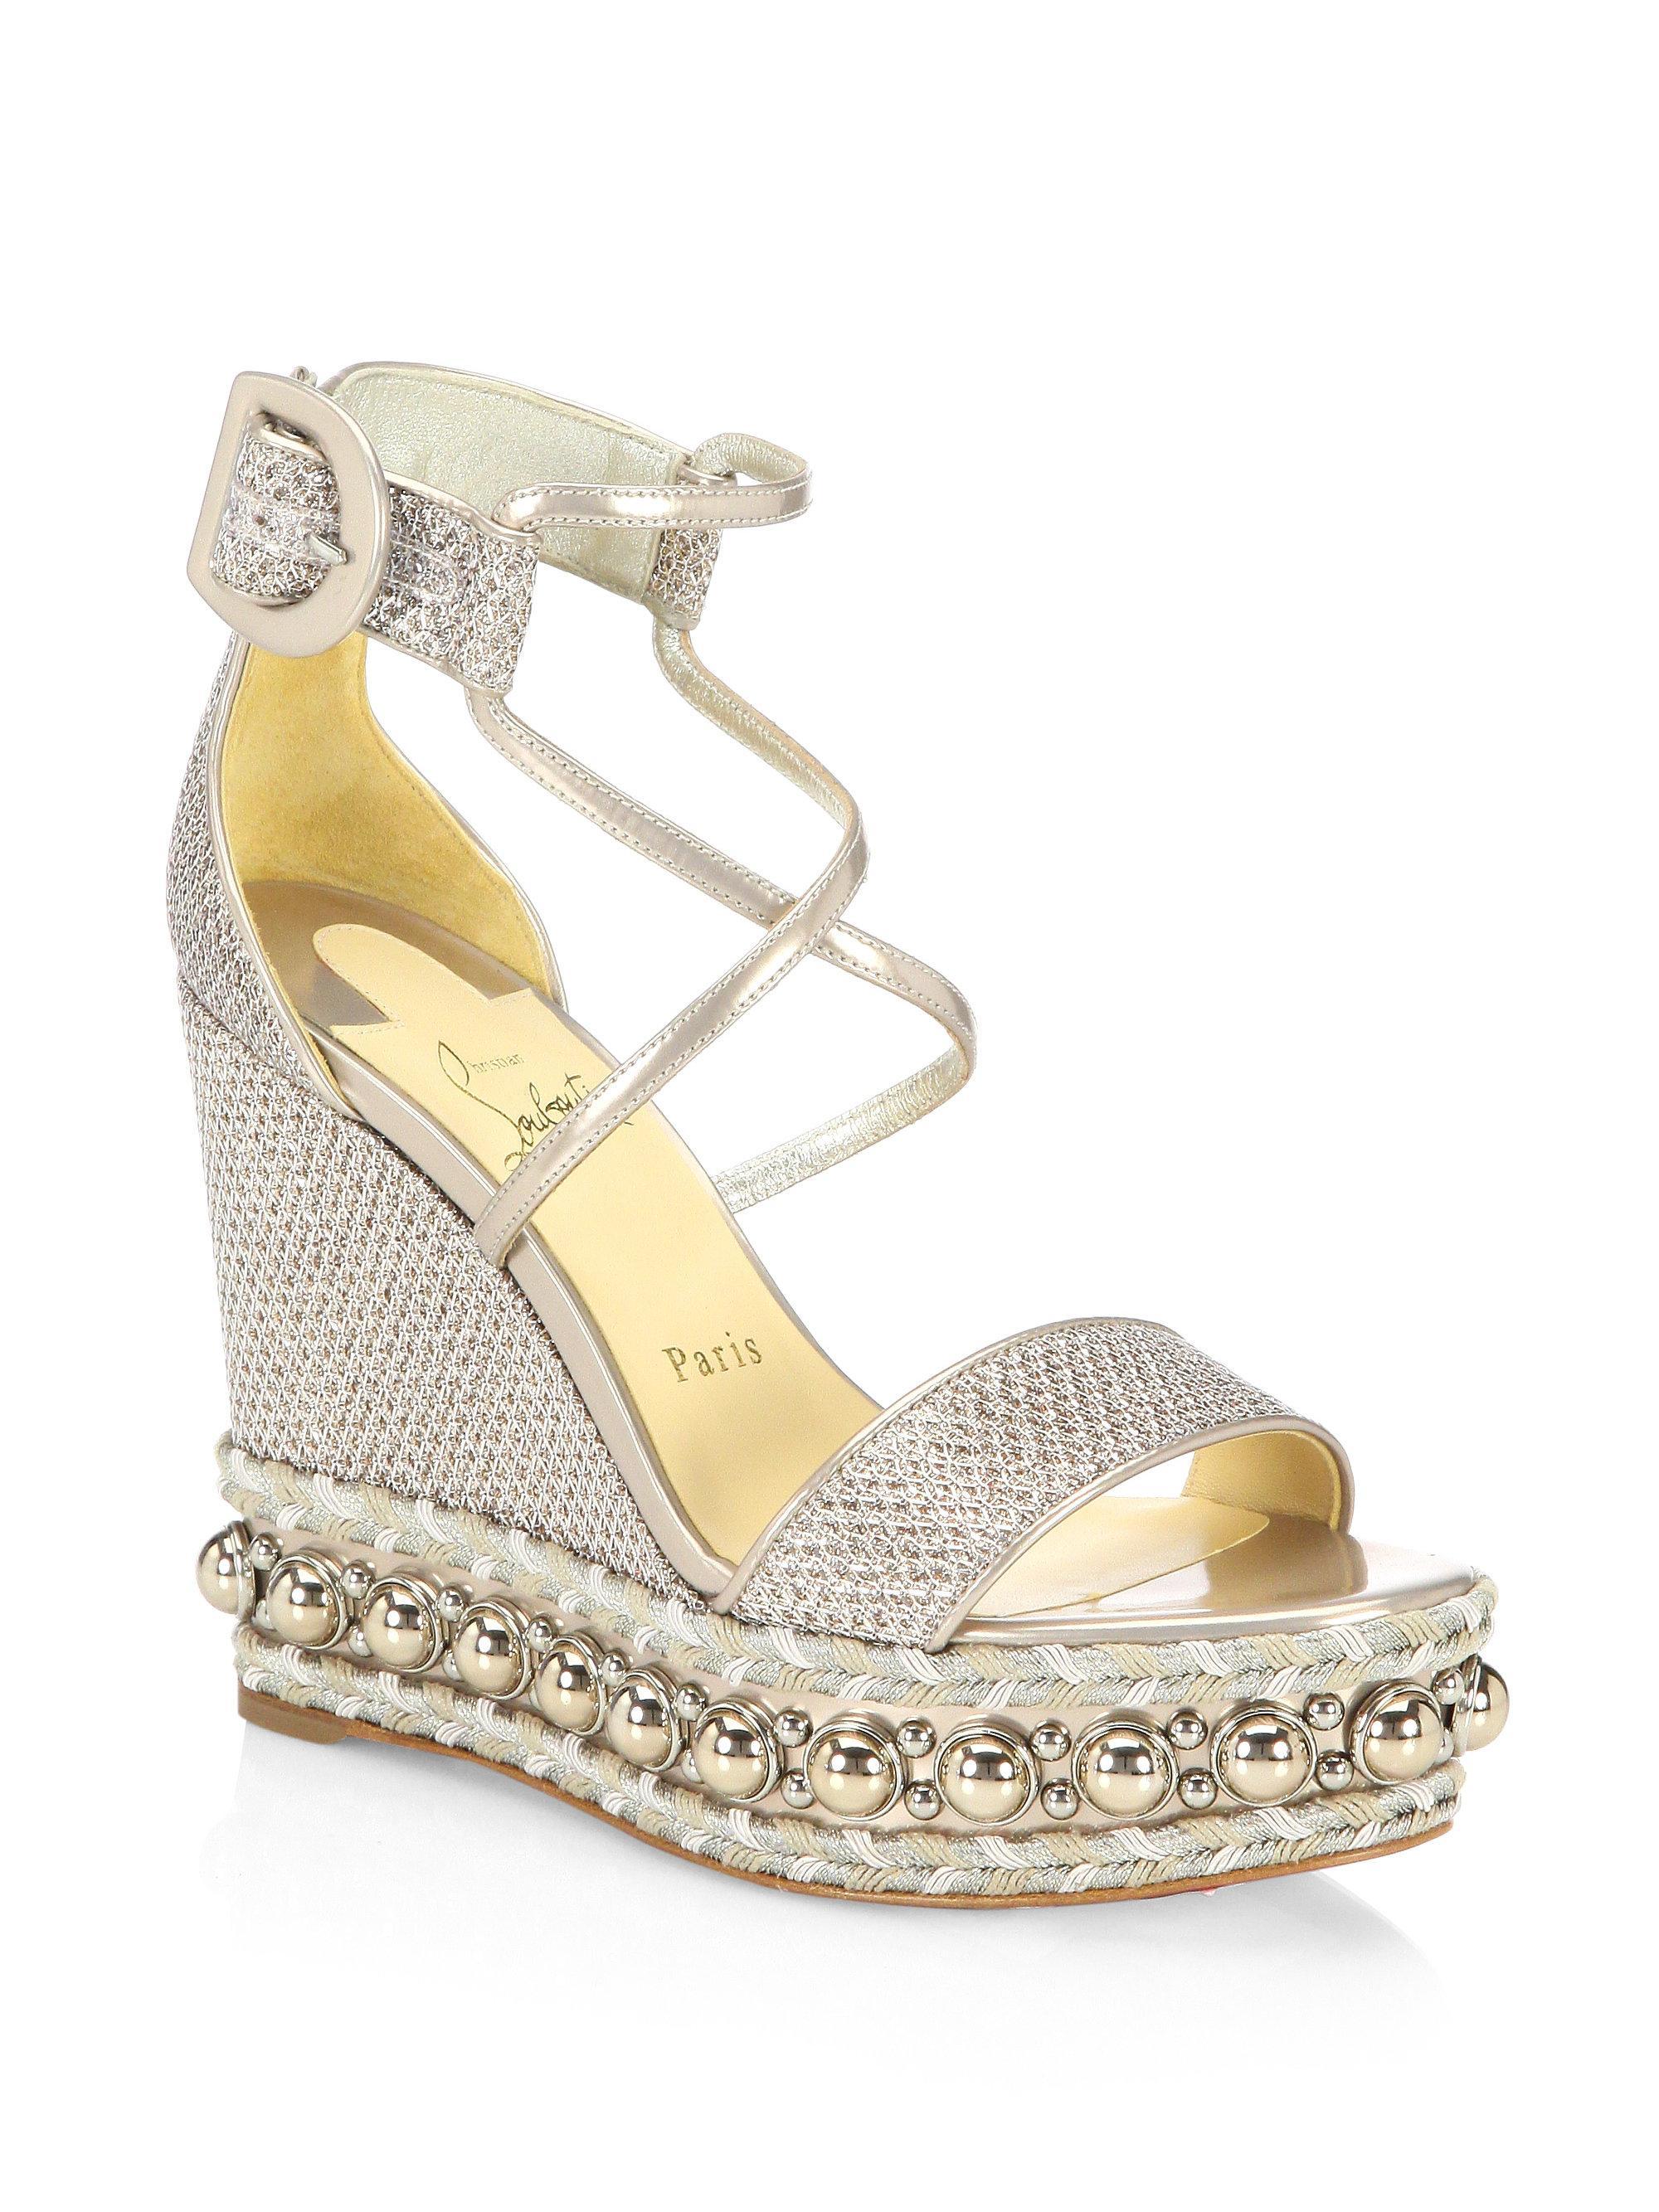 a1b839854e34 Christian Louboutin Chocazeppa Wedge Sandals in Natural - Lyst